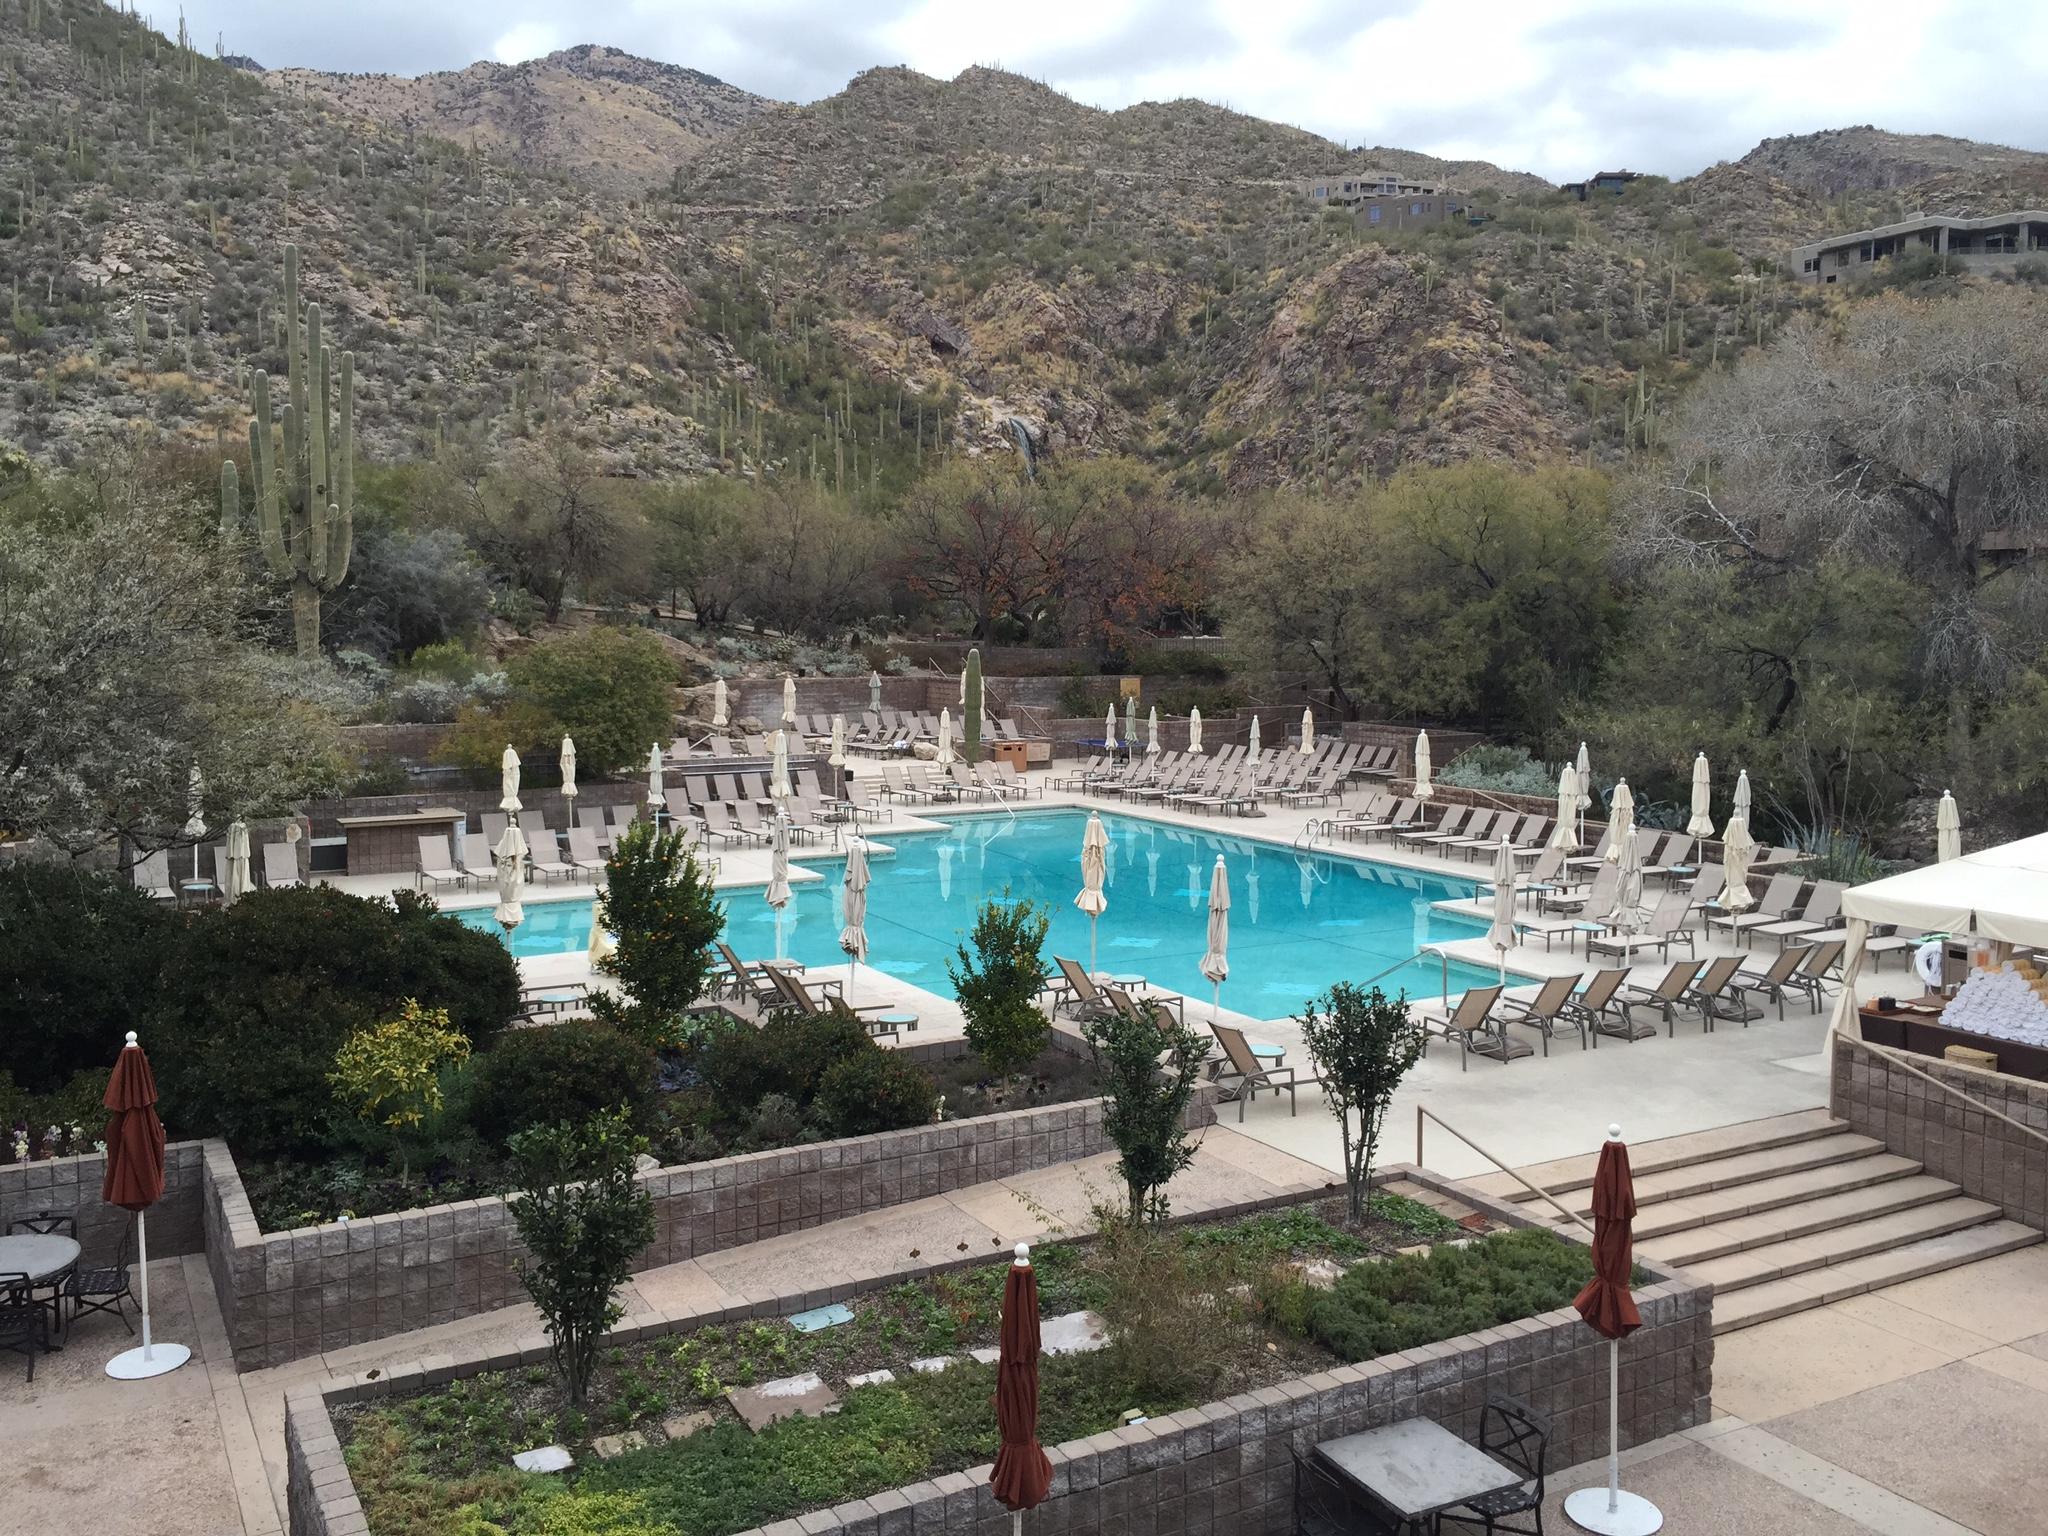 Loews Ventana Canyon Resort outdoor pool